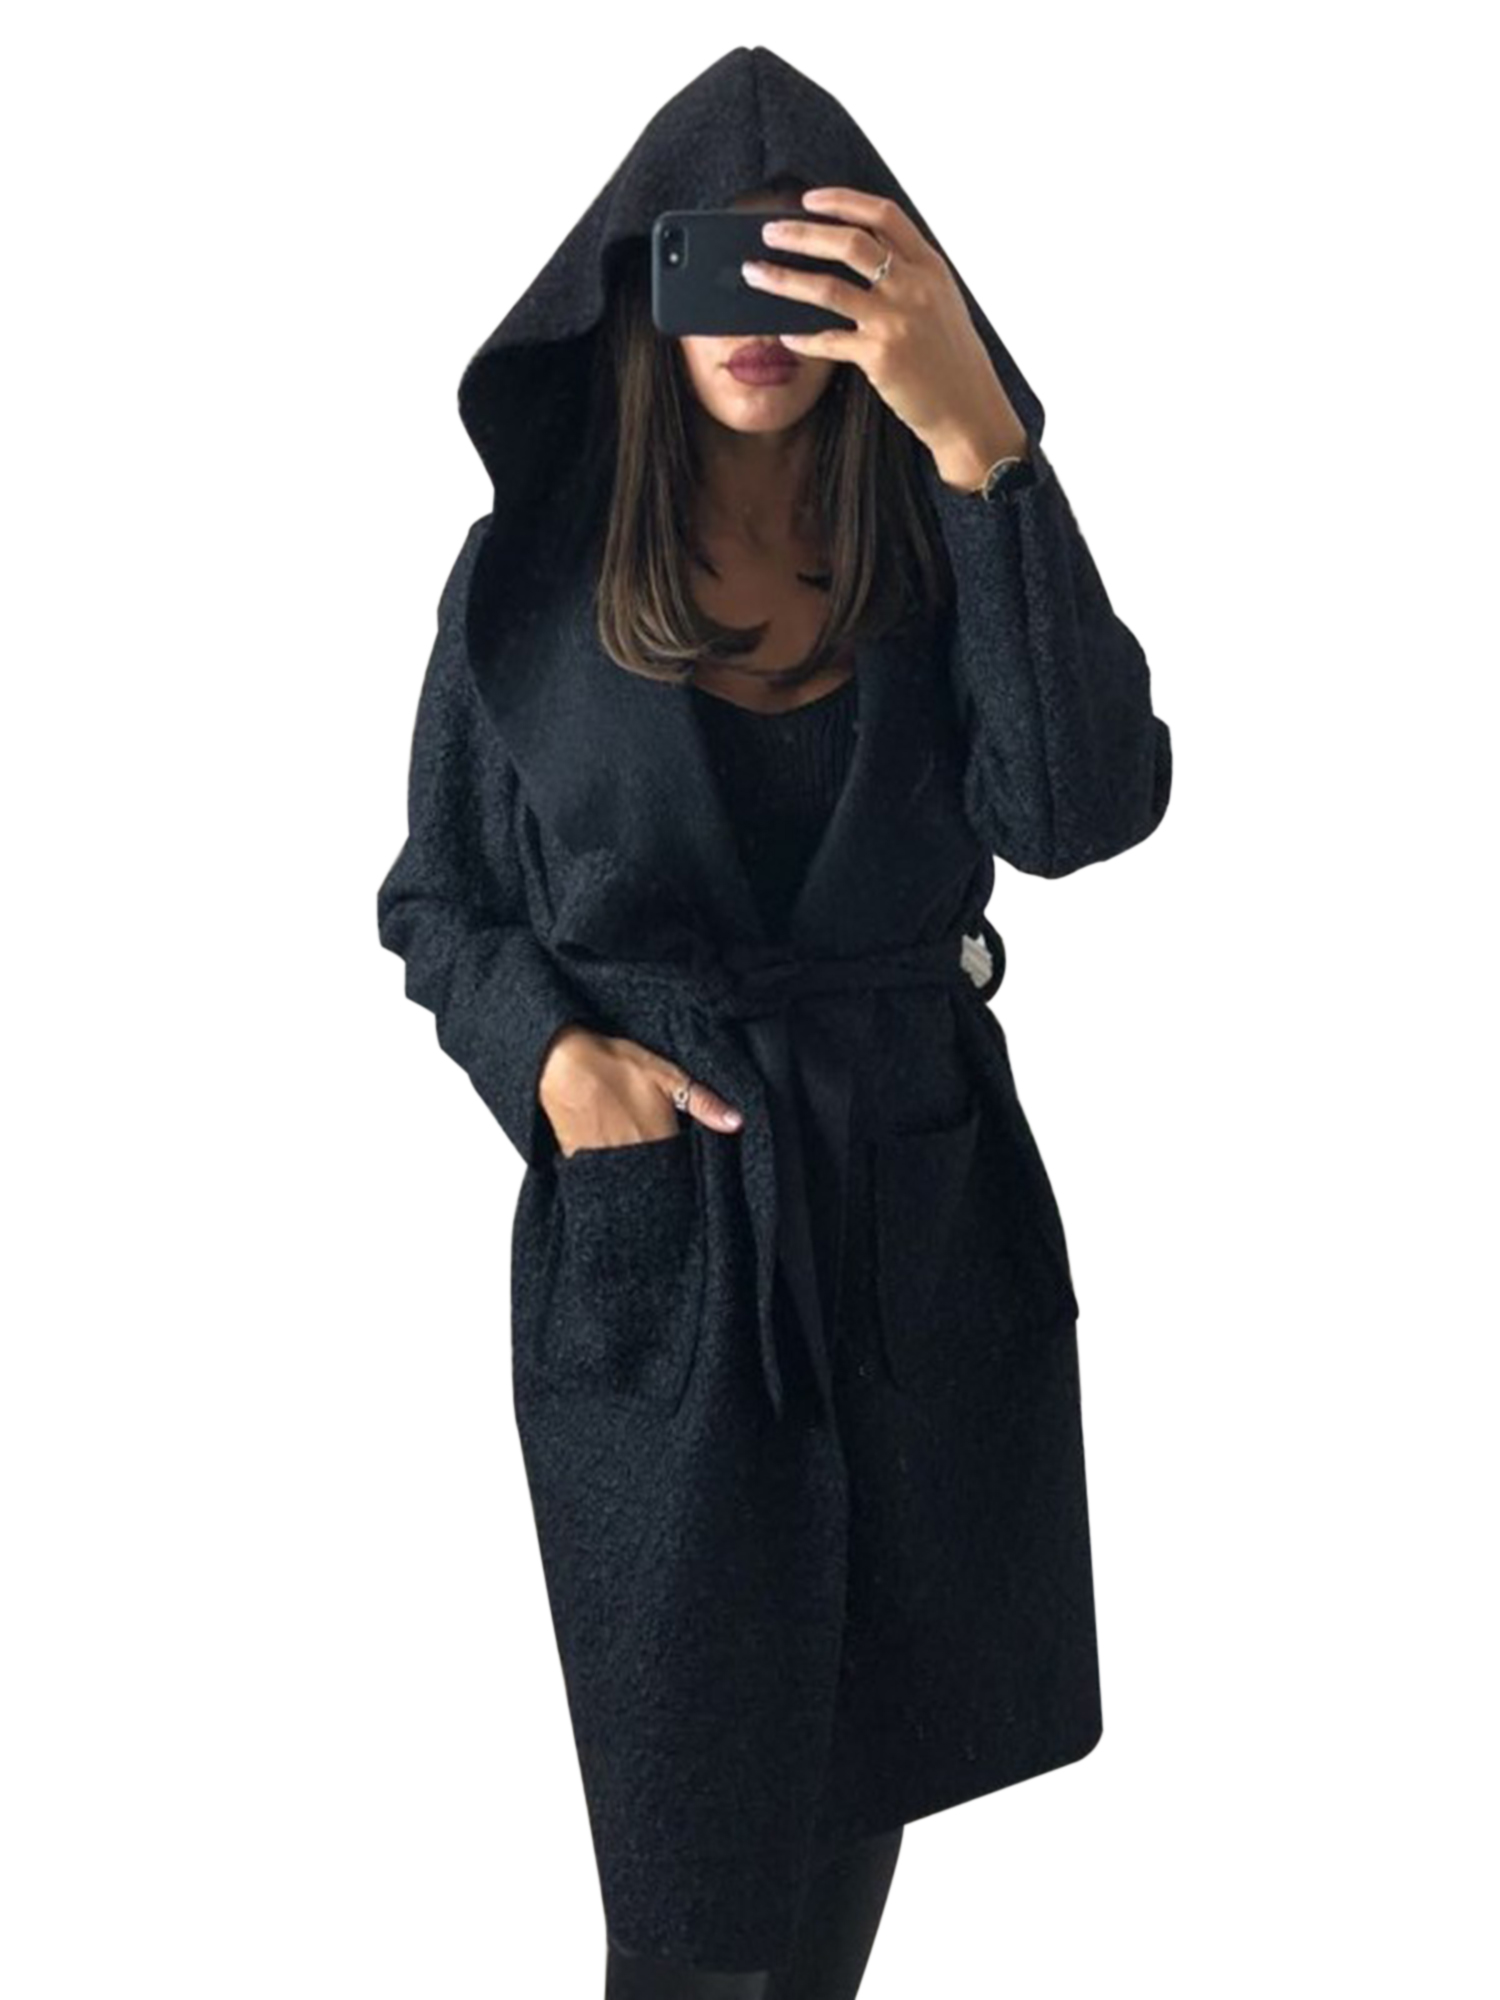 Women Hoodie Zip Sweatshirt Long Coat Jacket Top Cardigan Trench Parka Outerwear